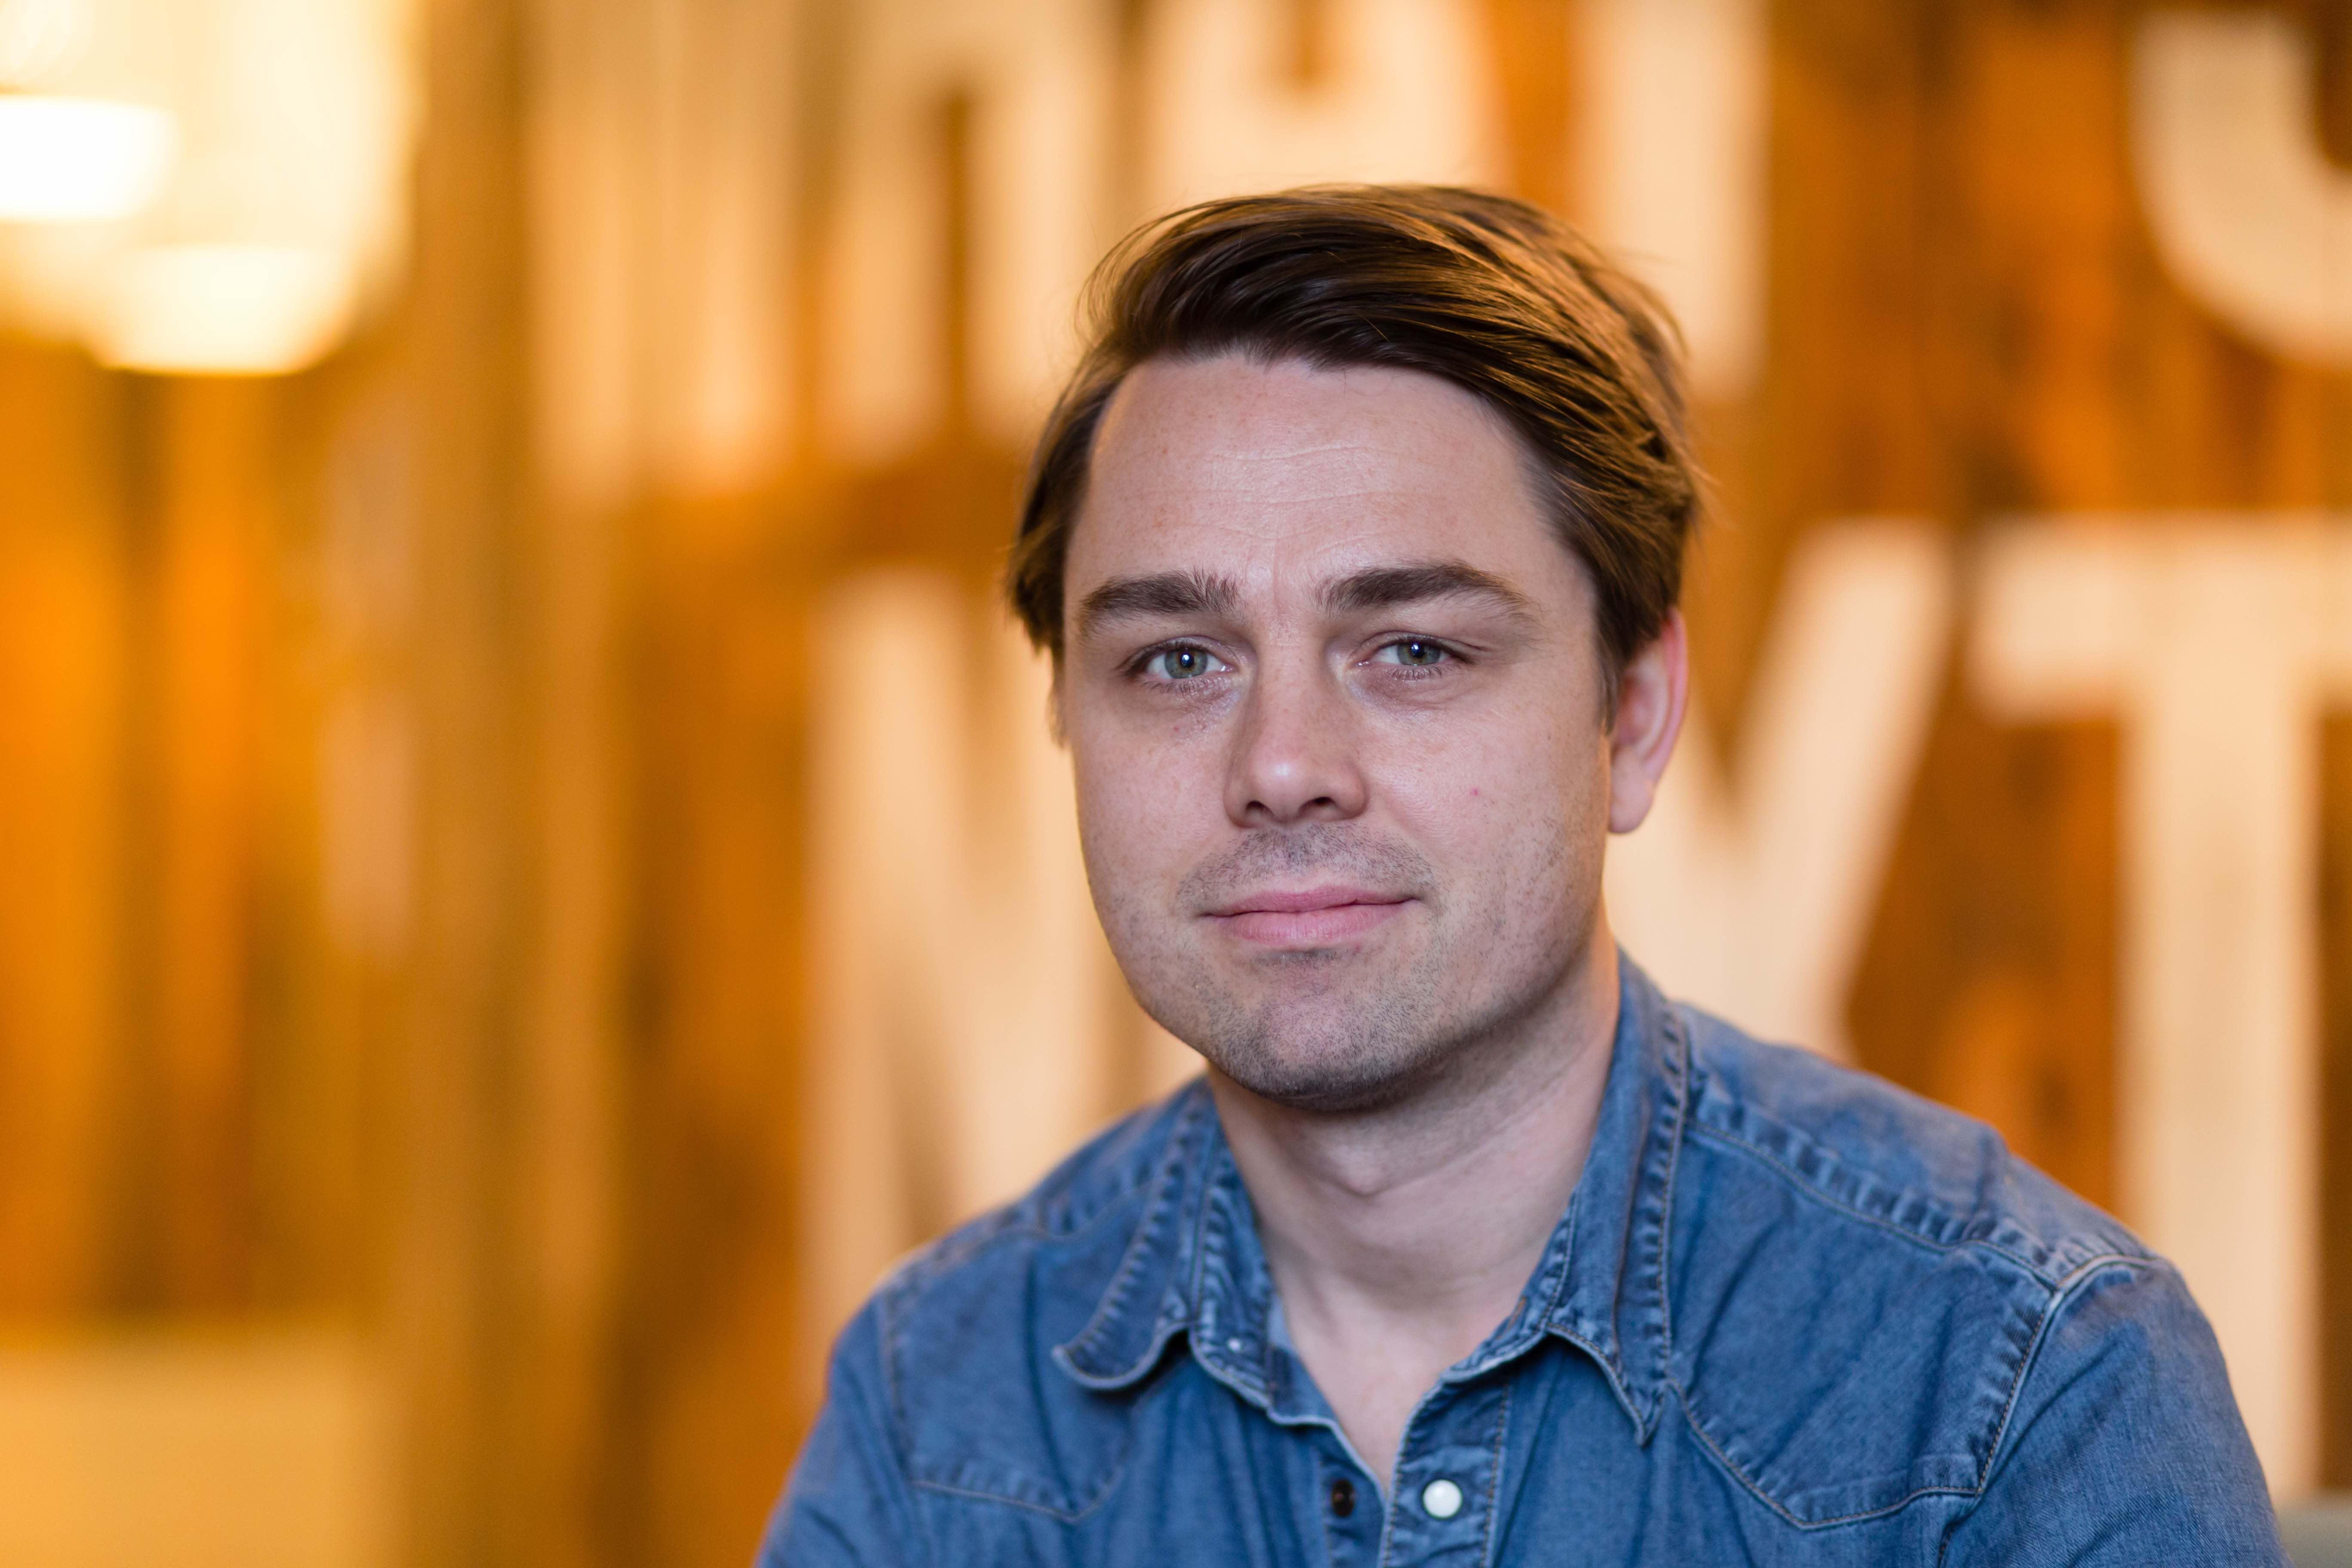 DigitasLBi Appoints Lars Glenne as Head of Media Strategy